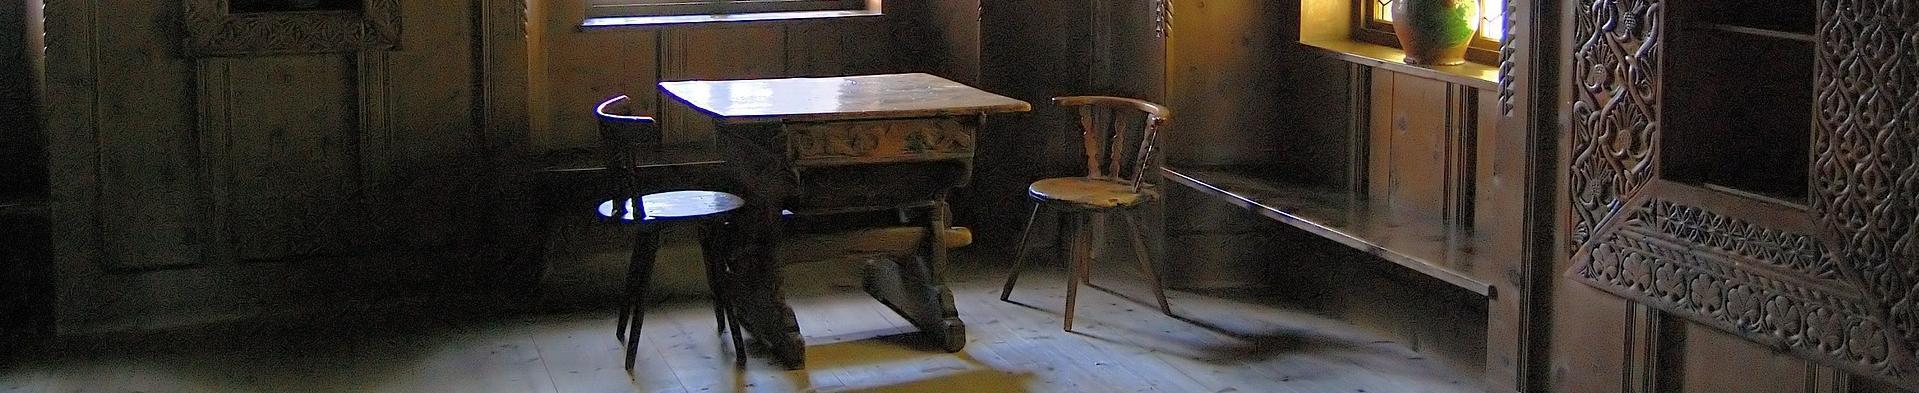 farmhouse-358286_1920